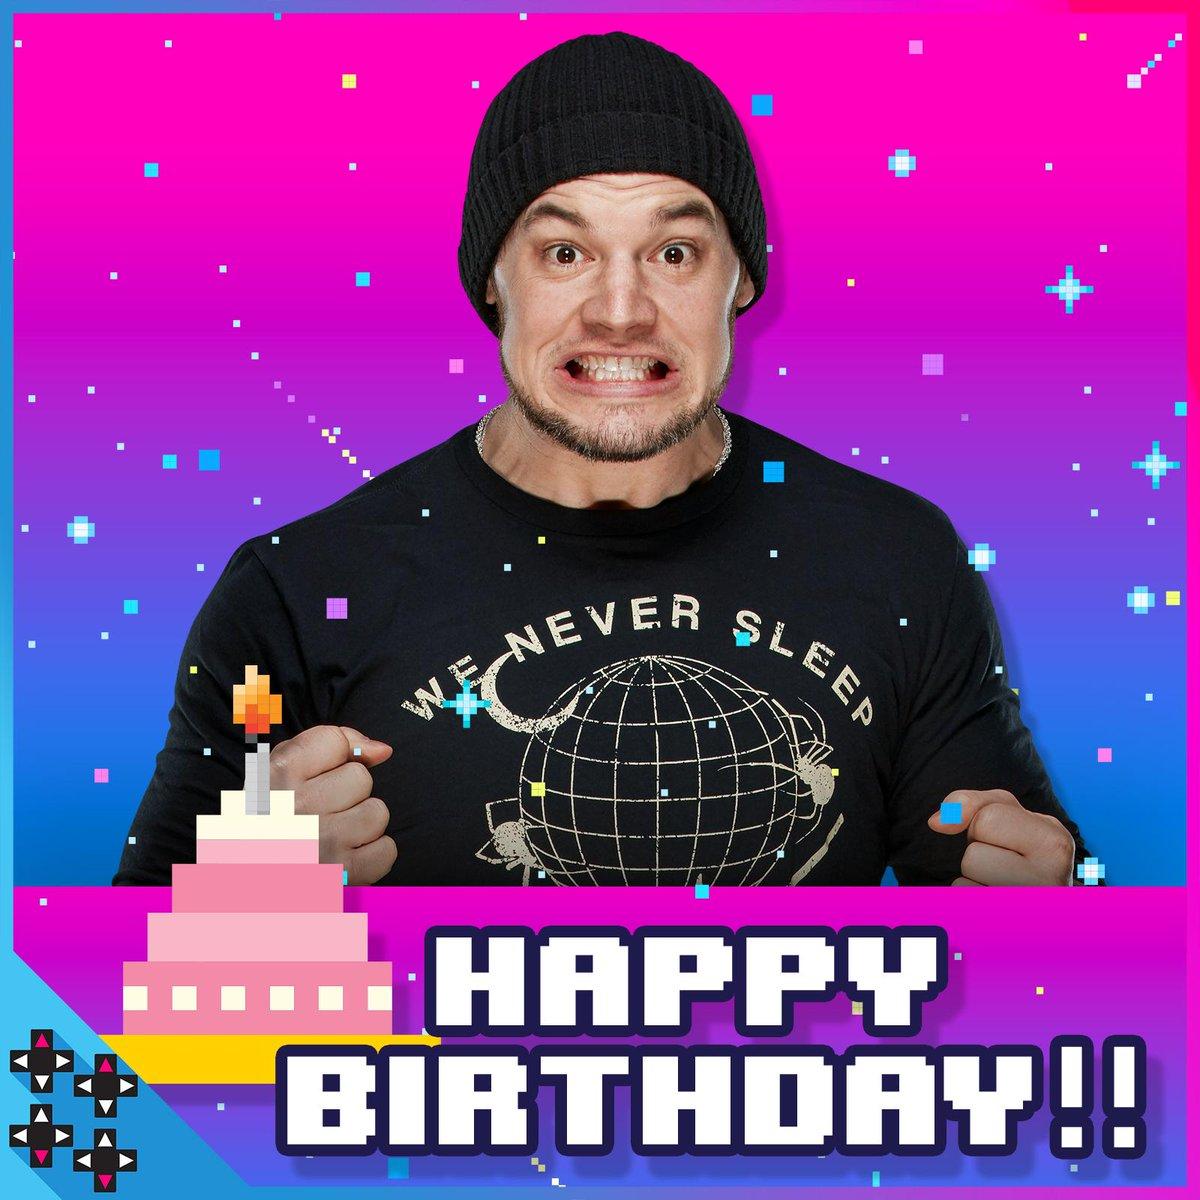 Birthday wishes go out to @BaronCorbinWWE! 🎉🎂🎮👑